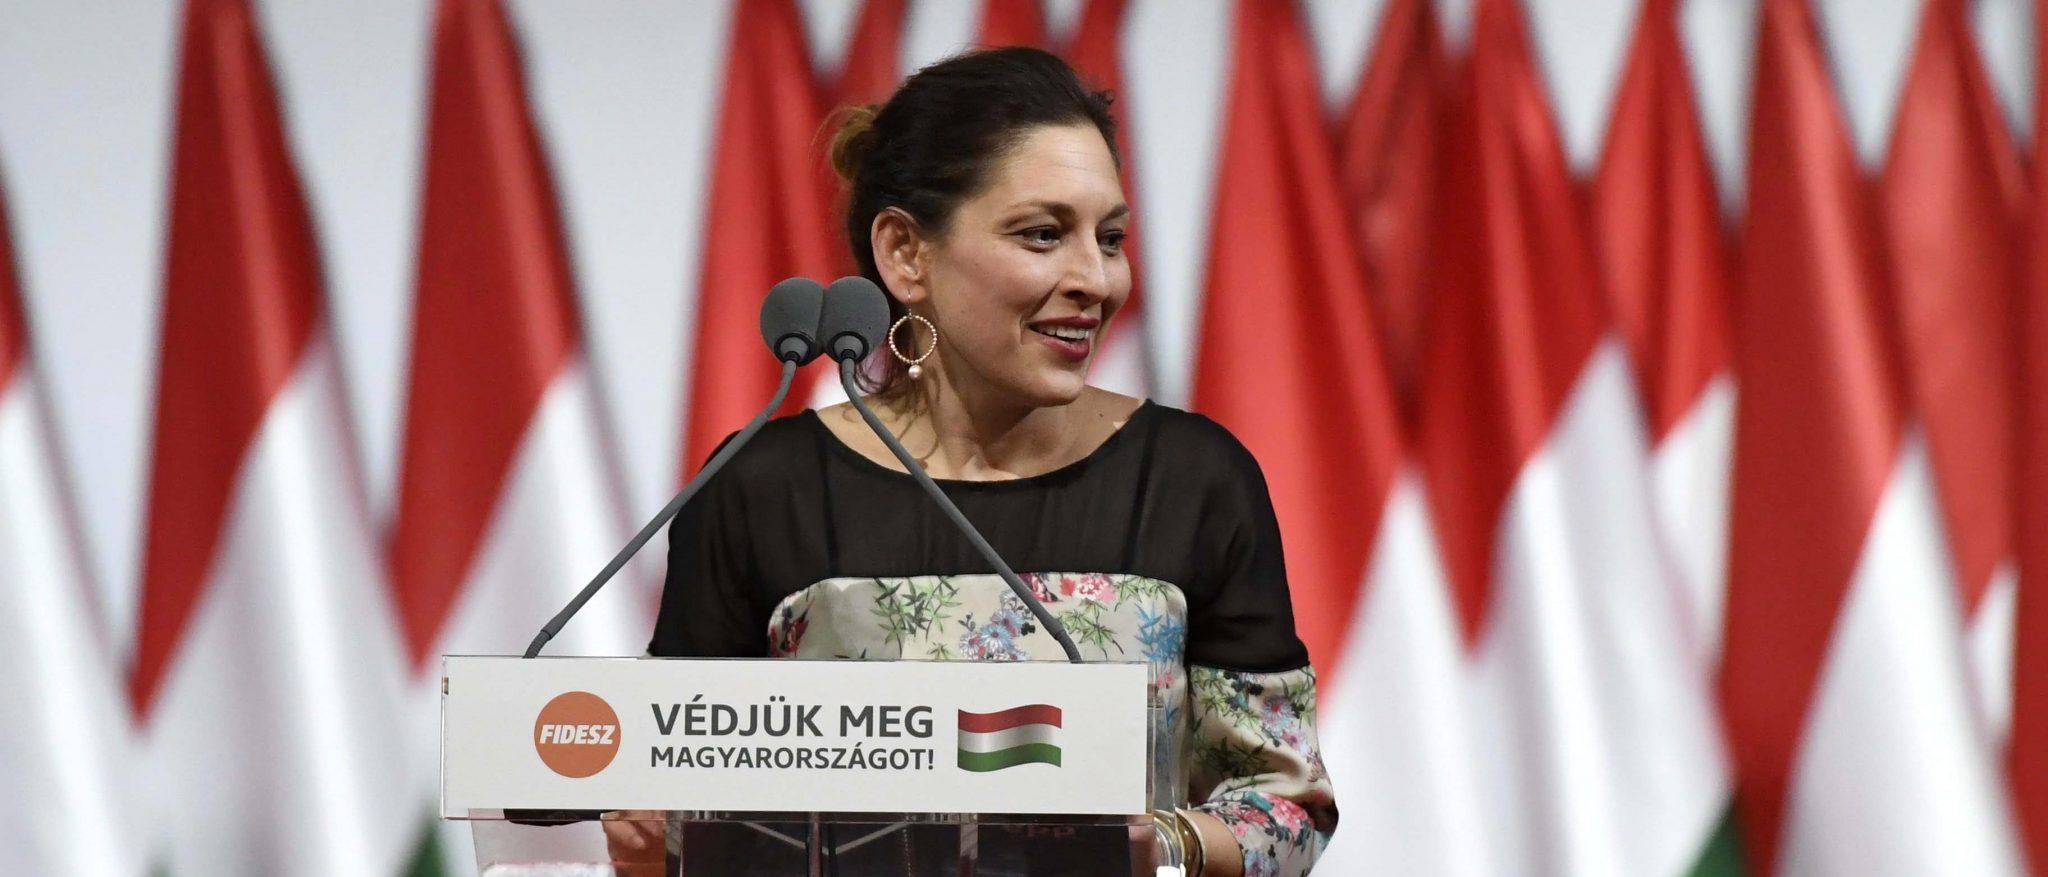 Fidesz's Járóka, DK's Dobrev Elected EP Vice-presidents post's picture